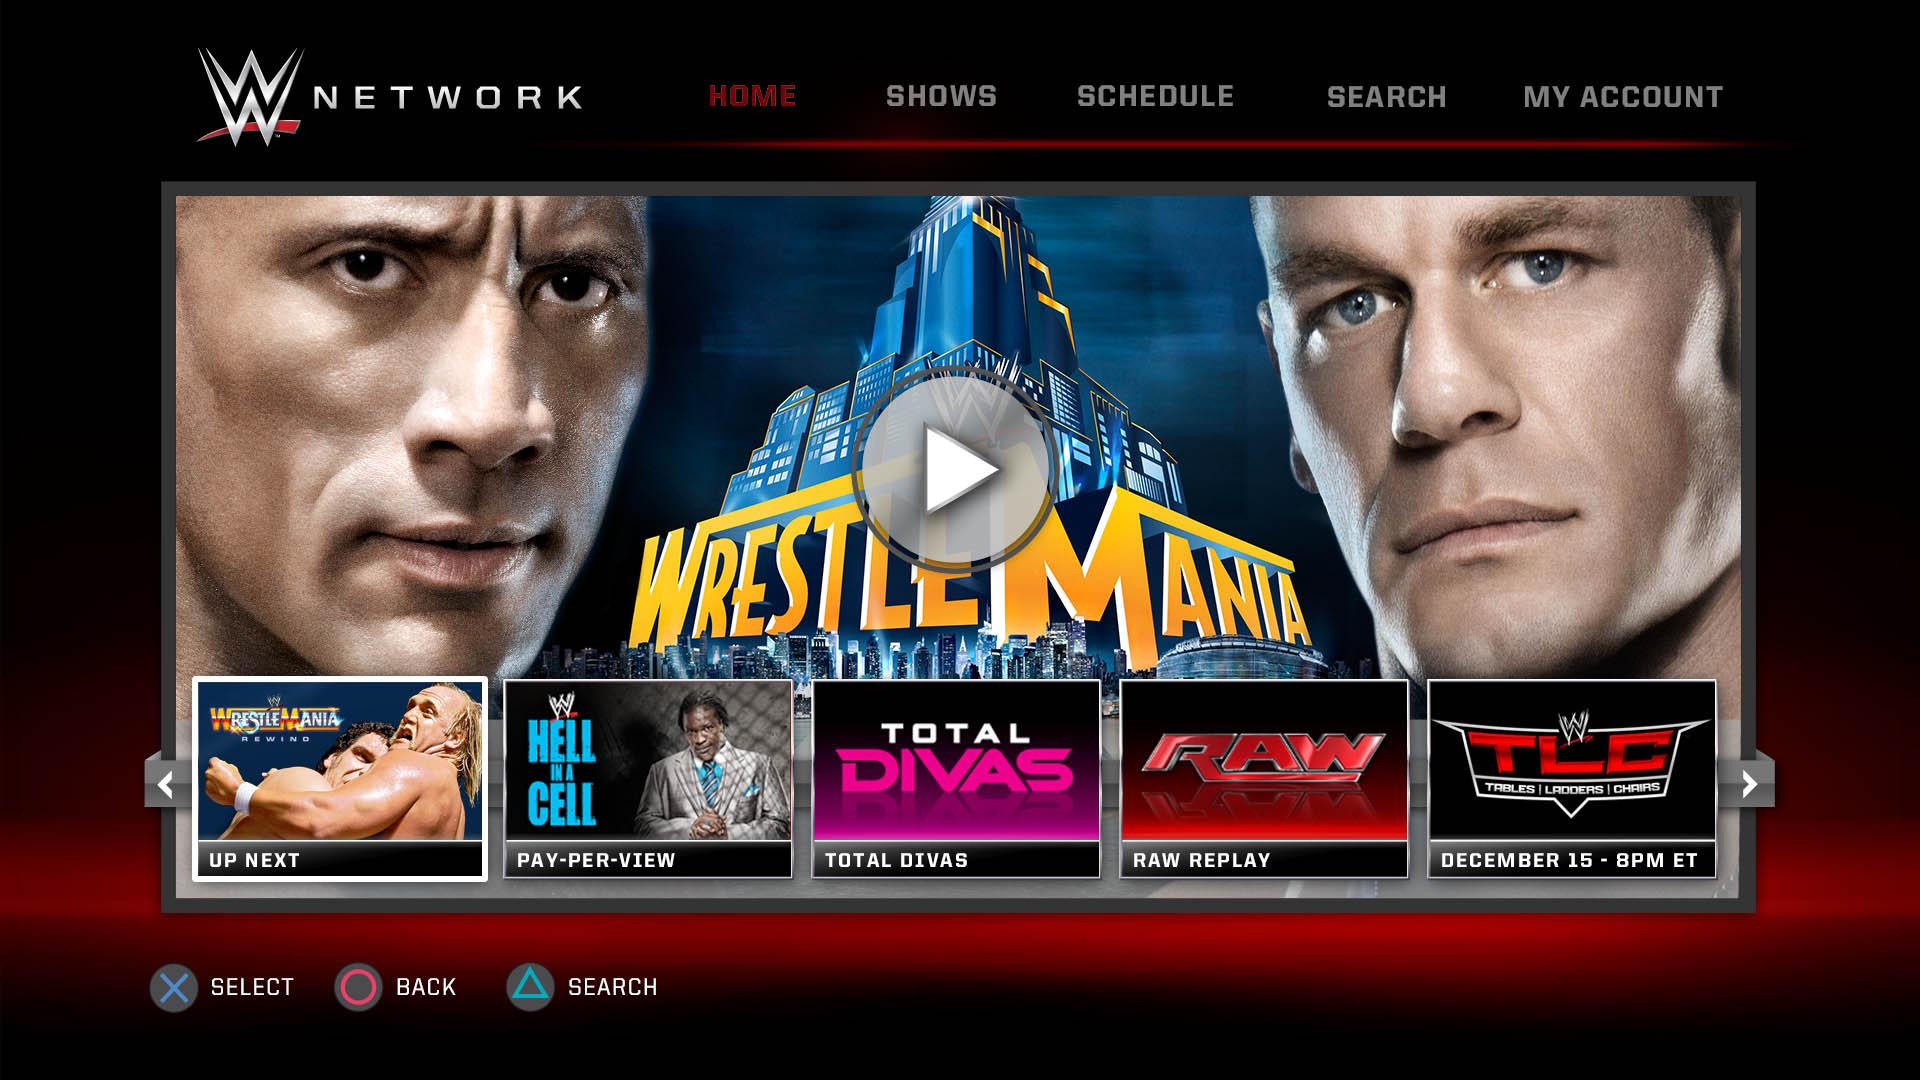 Network logout wwe Watch WWE